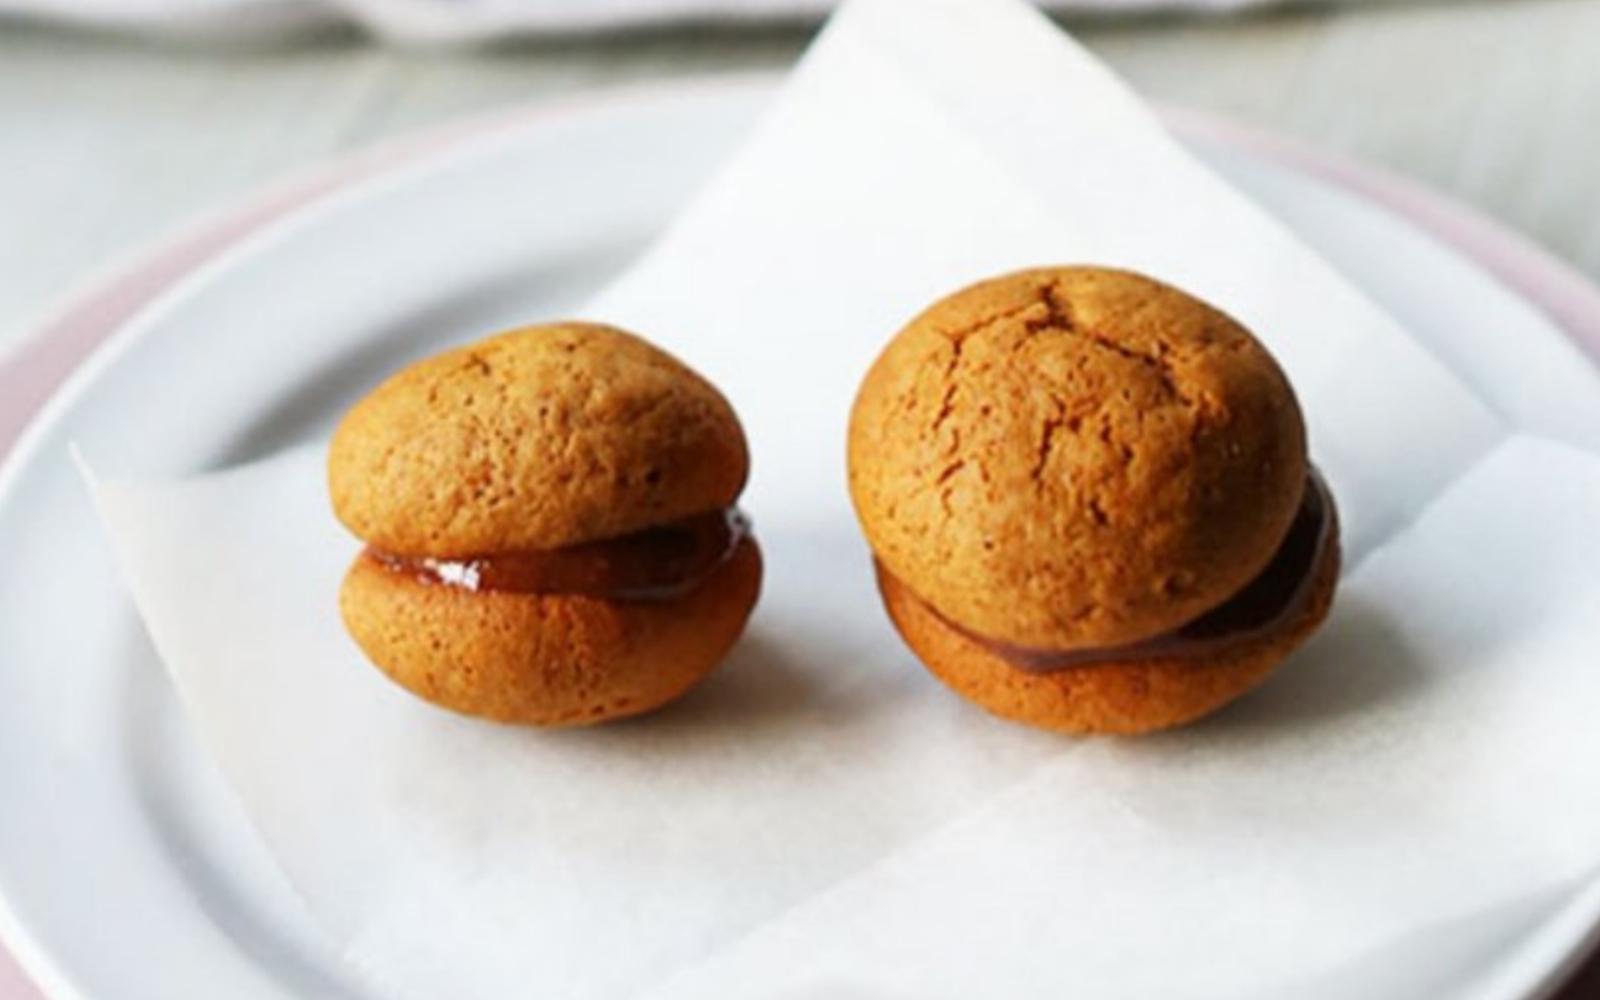 Peppernut Chocolate Hazelnut Macaroons